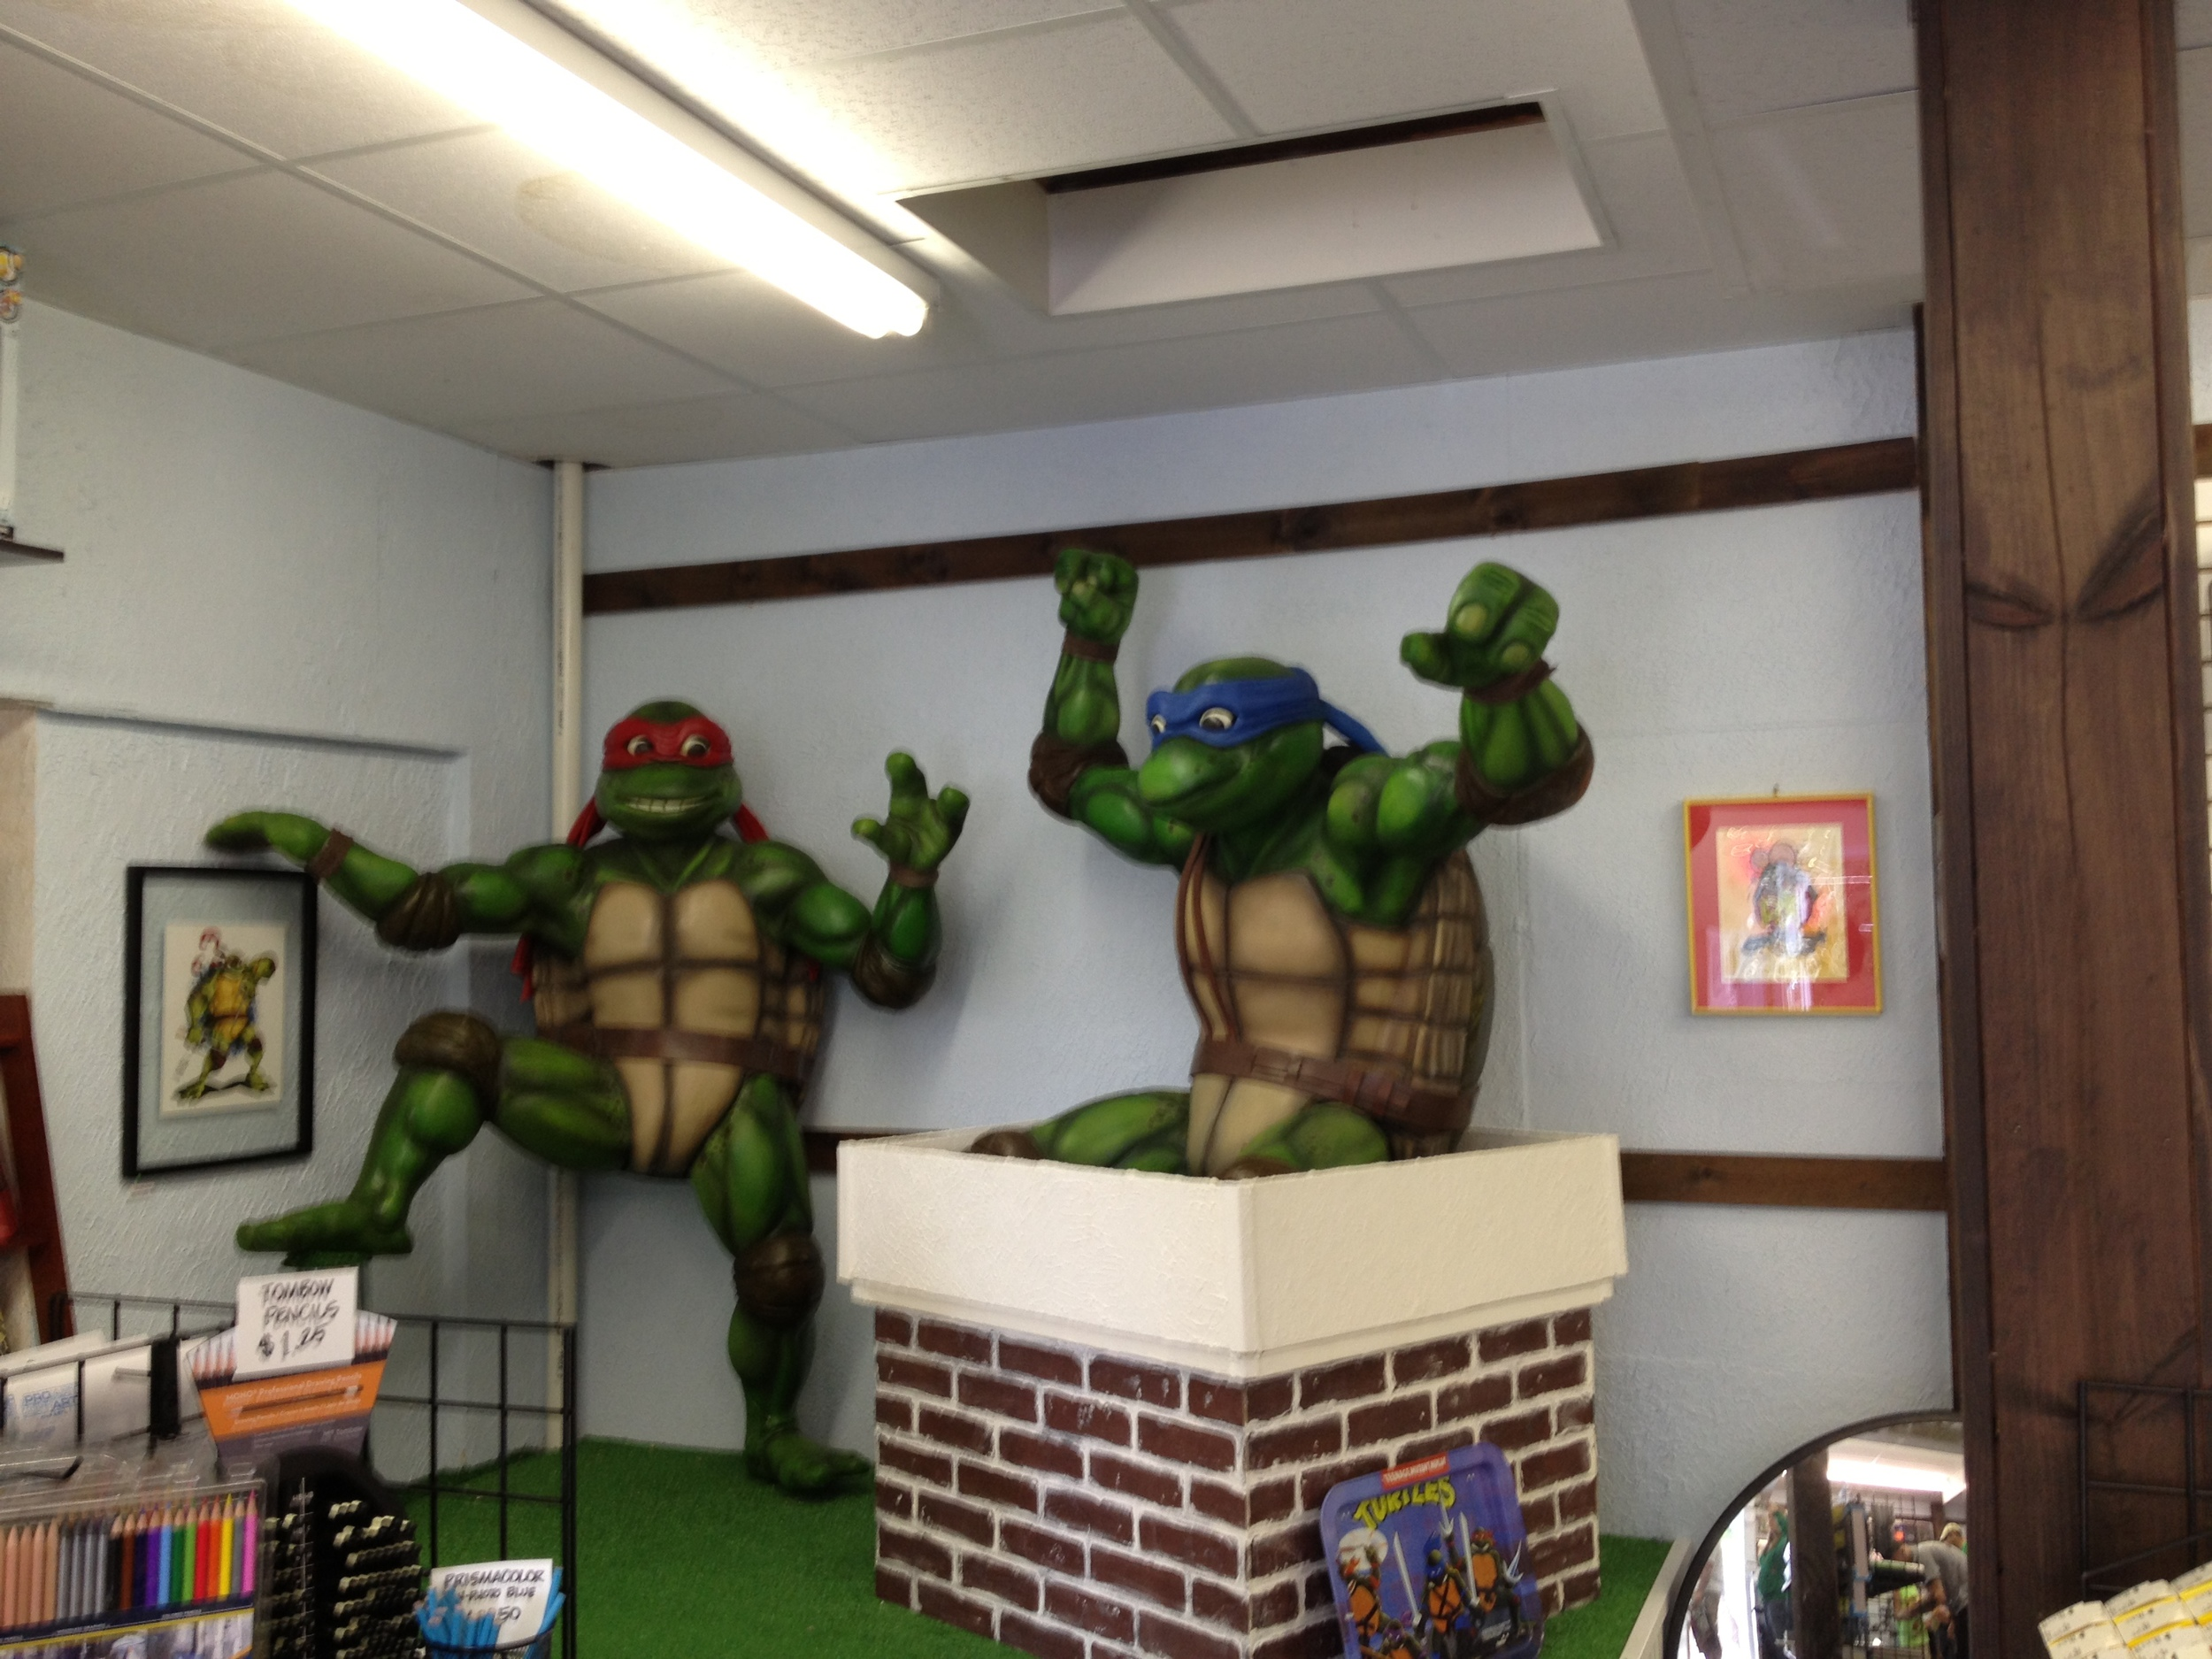 Raphael and Leonardo greet you!